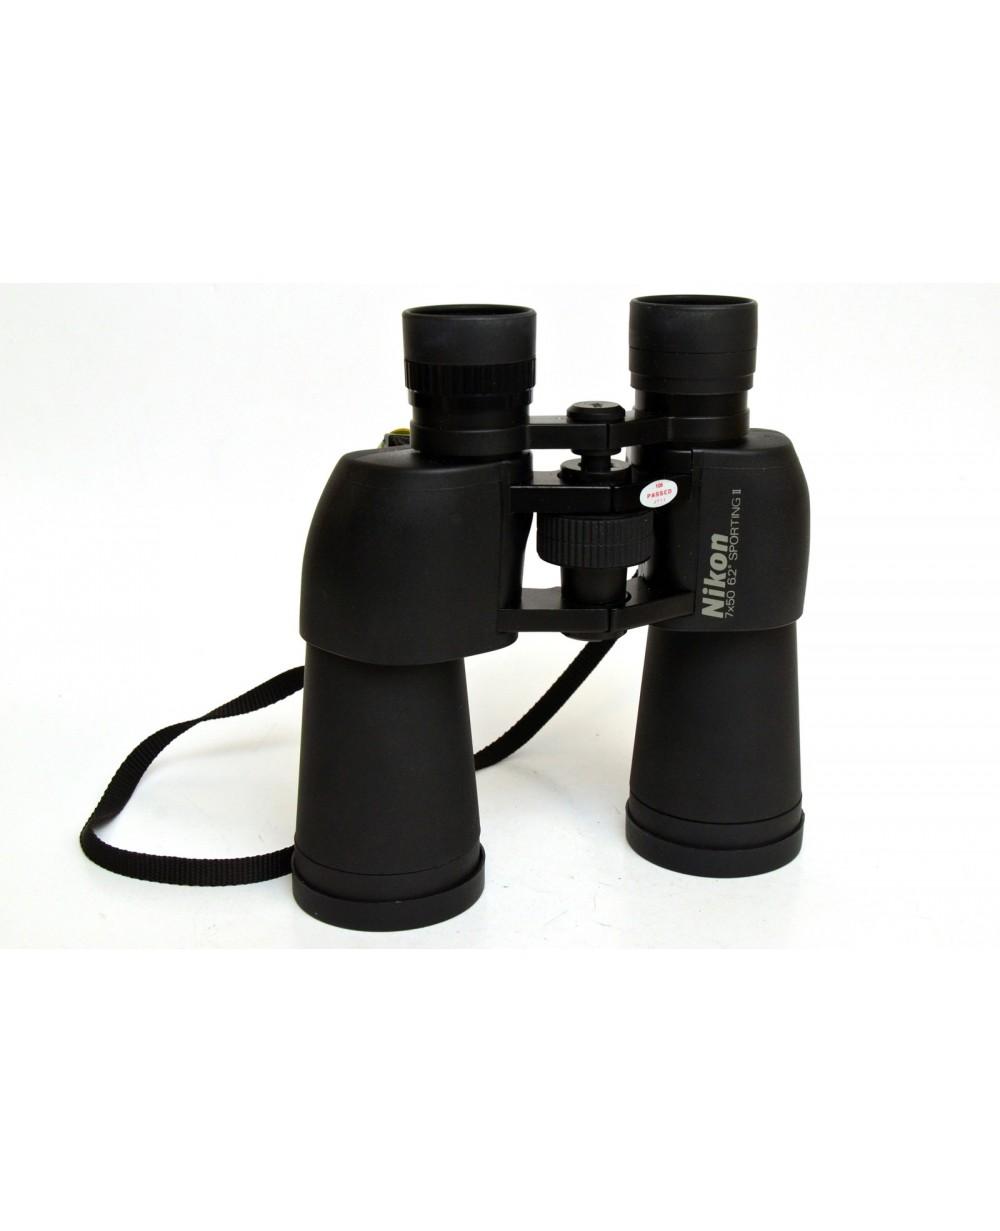 Nikon Binocolo Sporting 7 X 50 Cf Binocular Cases & Accessories Binoculars & Telescopes